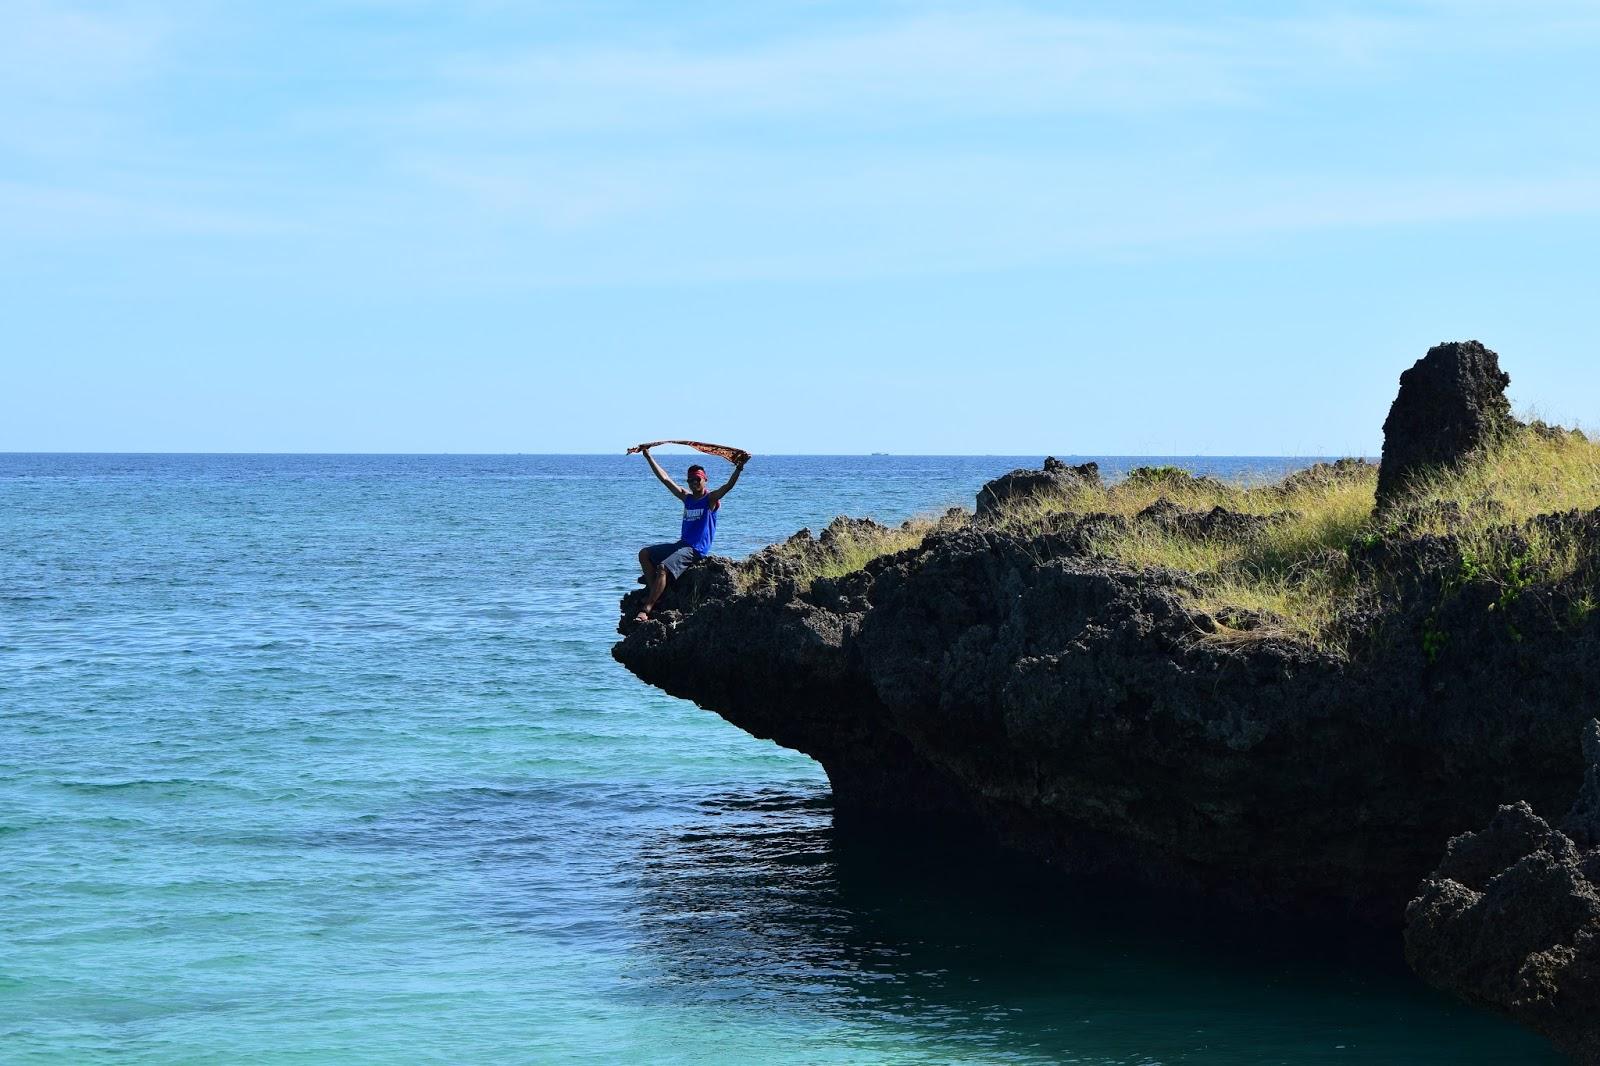 Arianto Ntt Pantai Kelapa Satu Kota Kupang Ketapang Kab